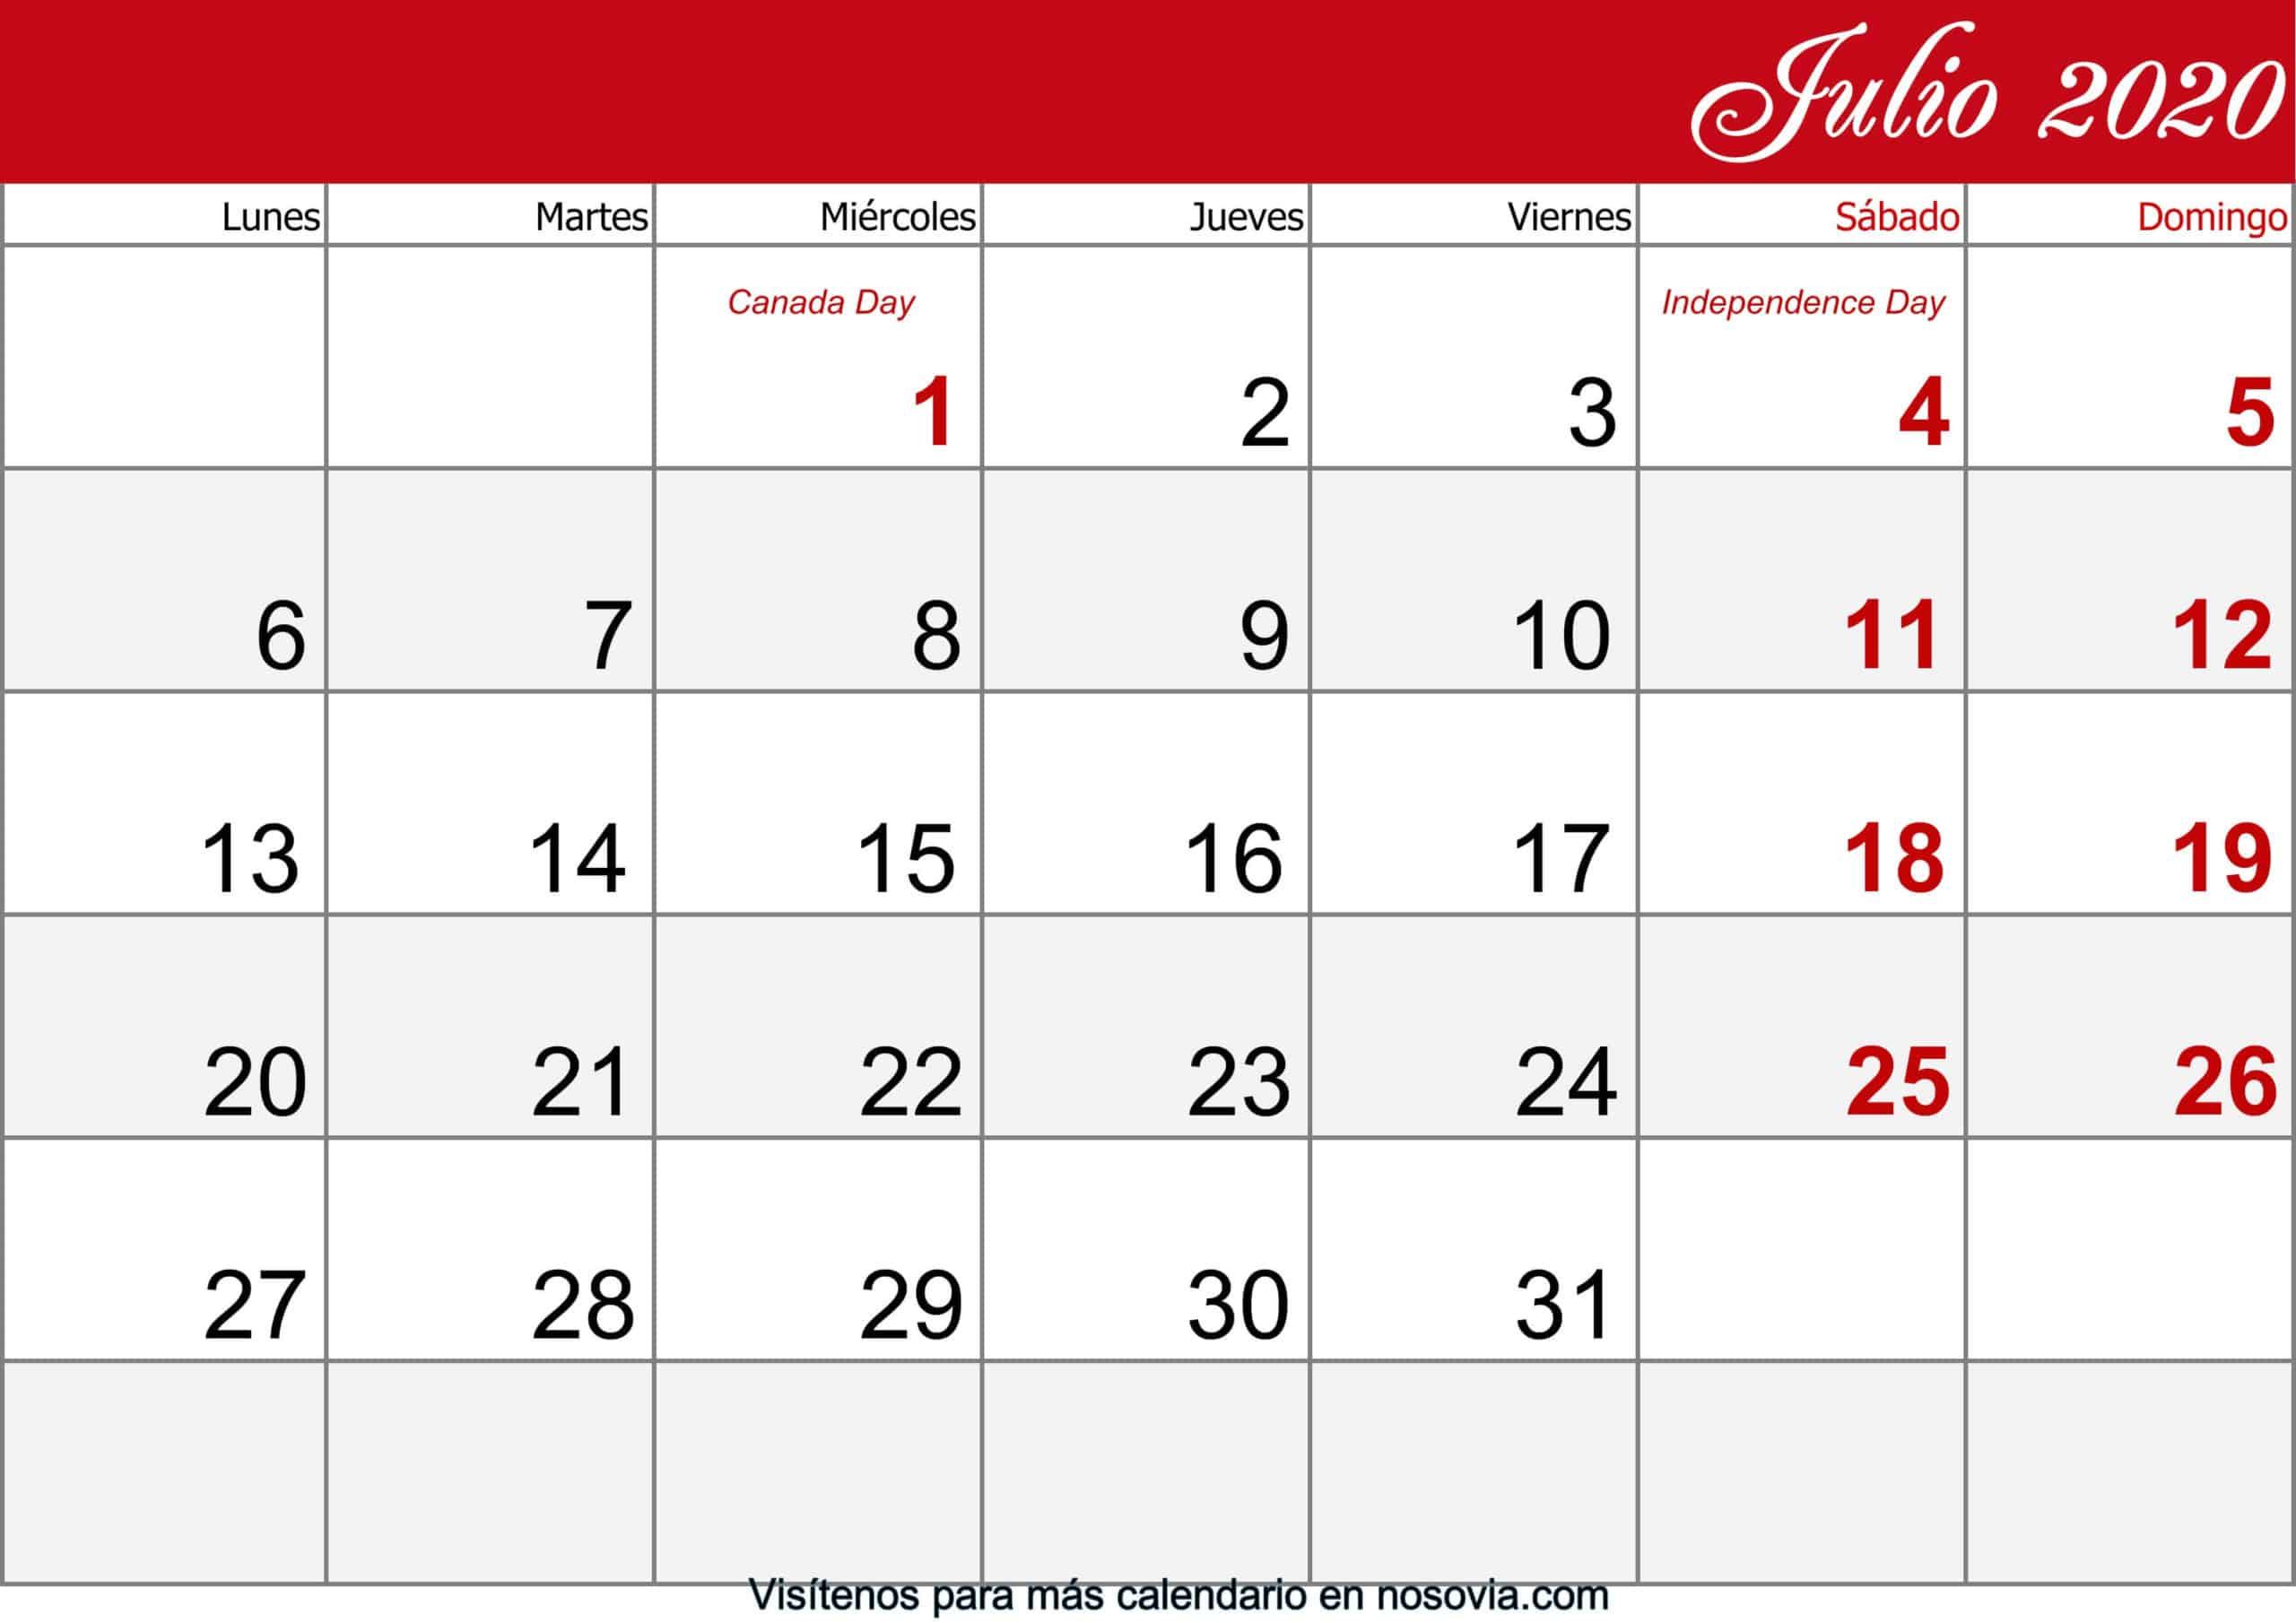 Calendario-julio-2020-Con-Festivos-imprimible